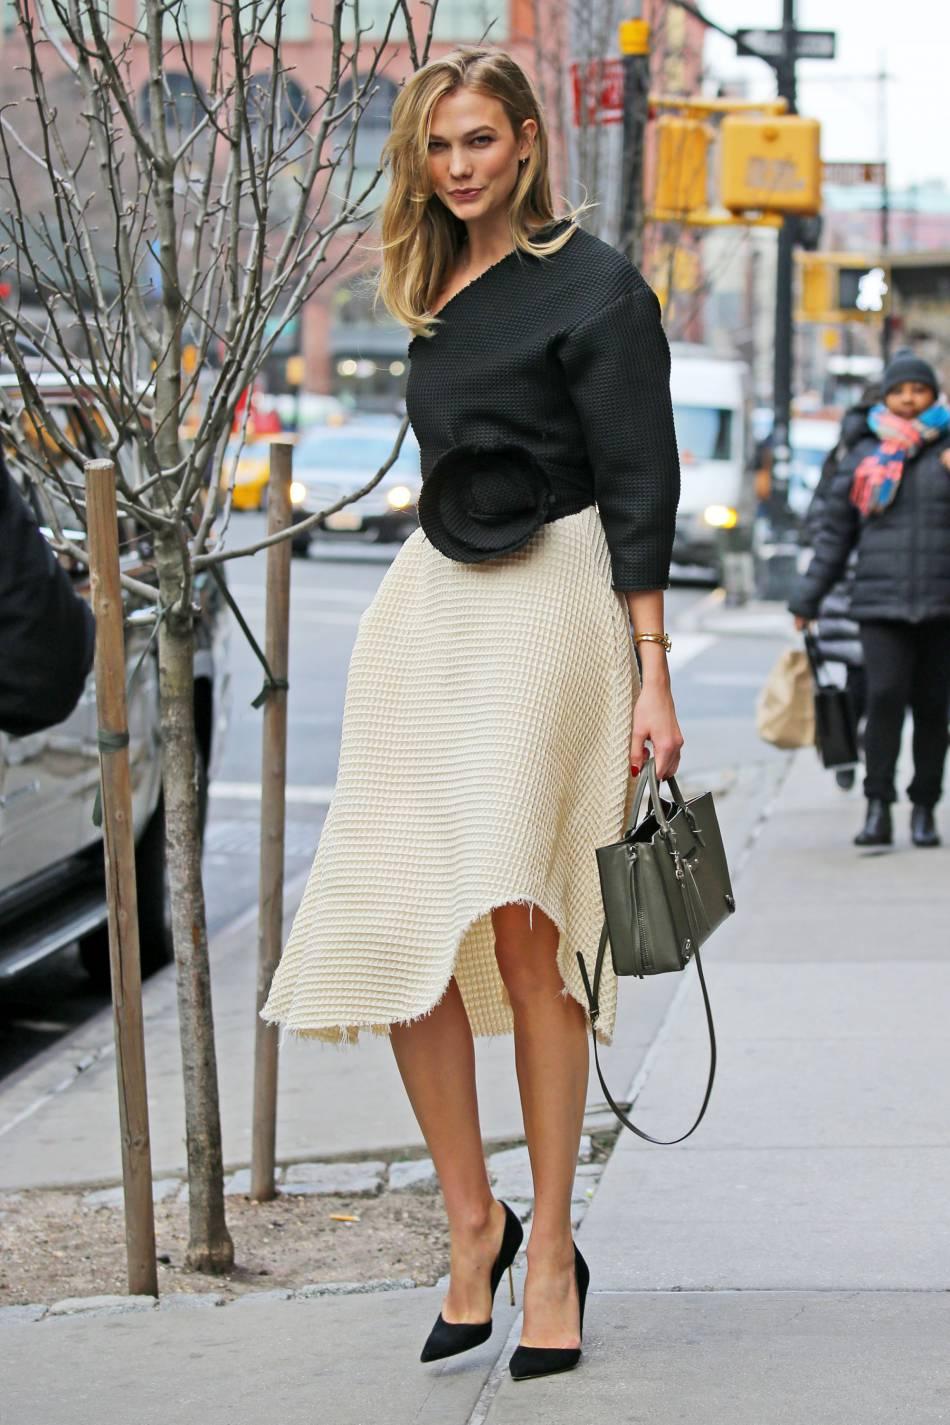 Karlie Kloss terriblement chic et sexy dans les rues de New York.